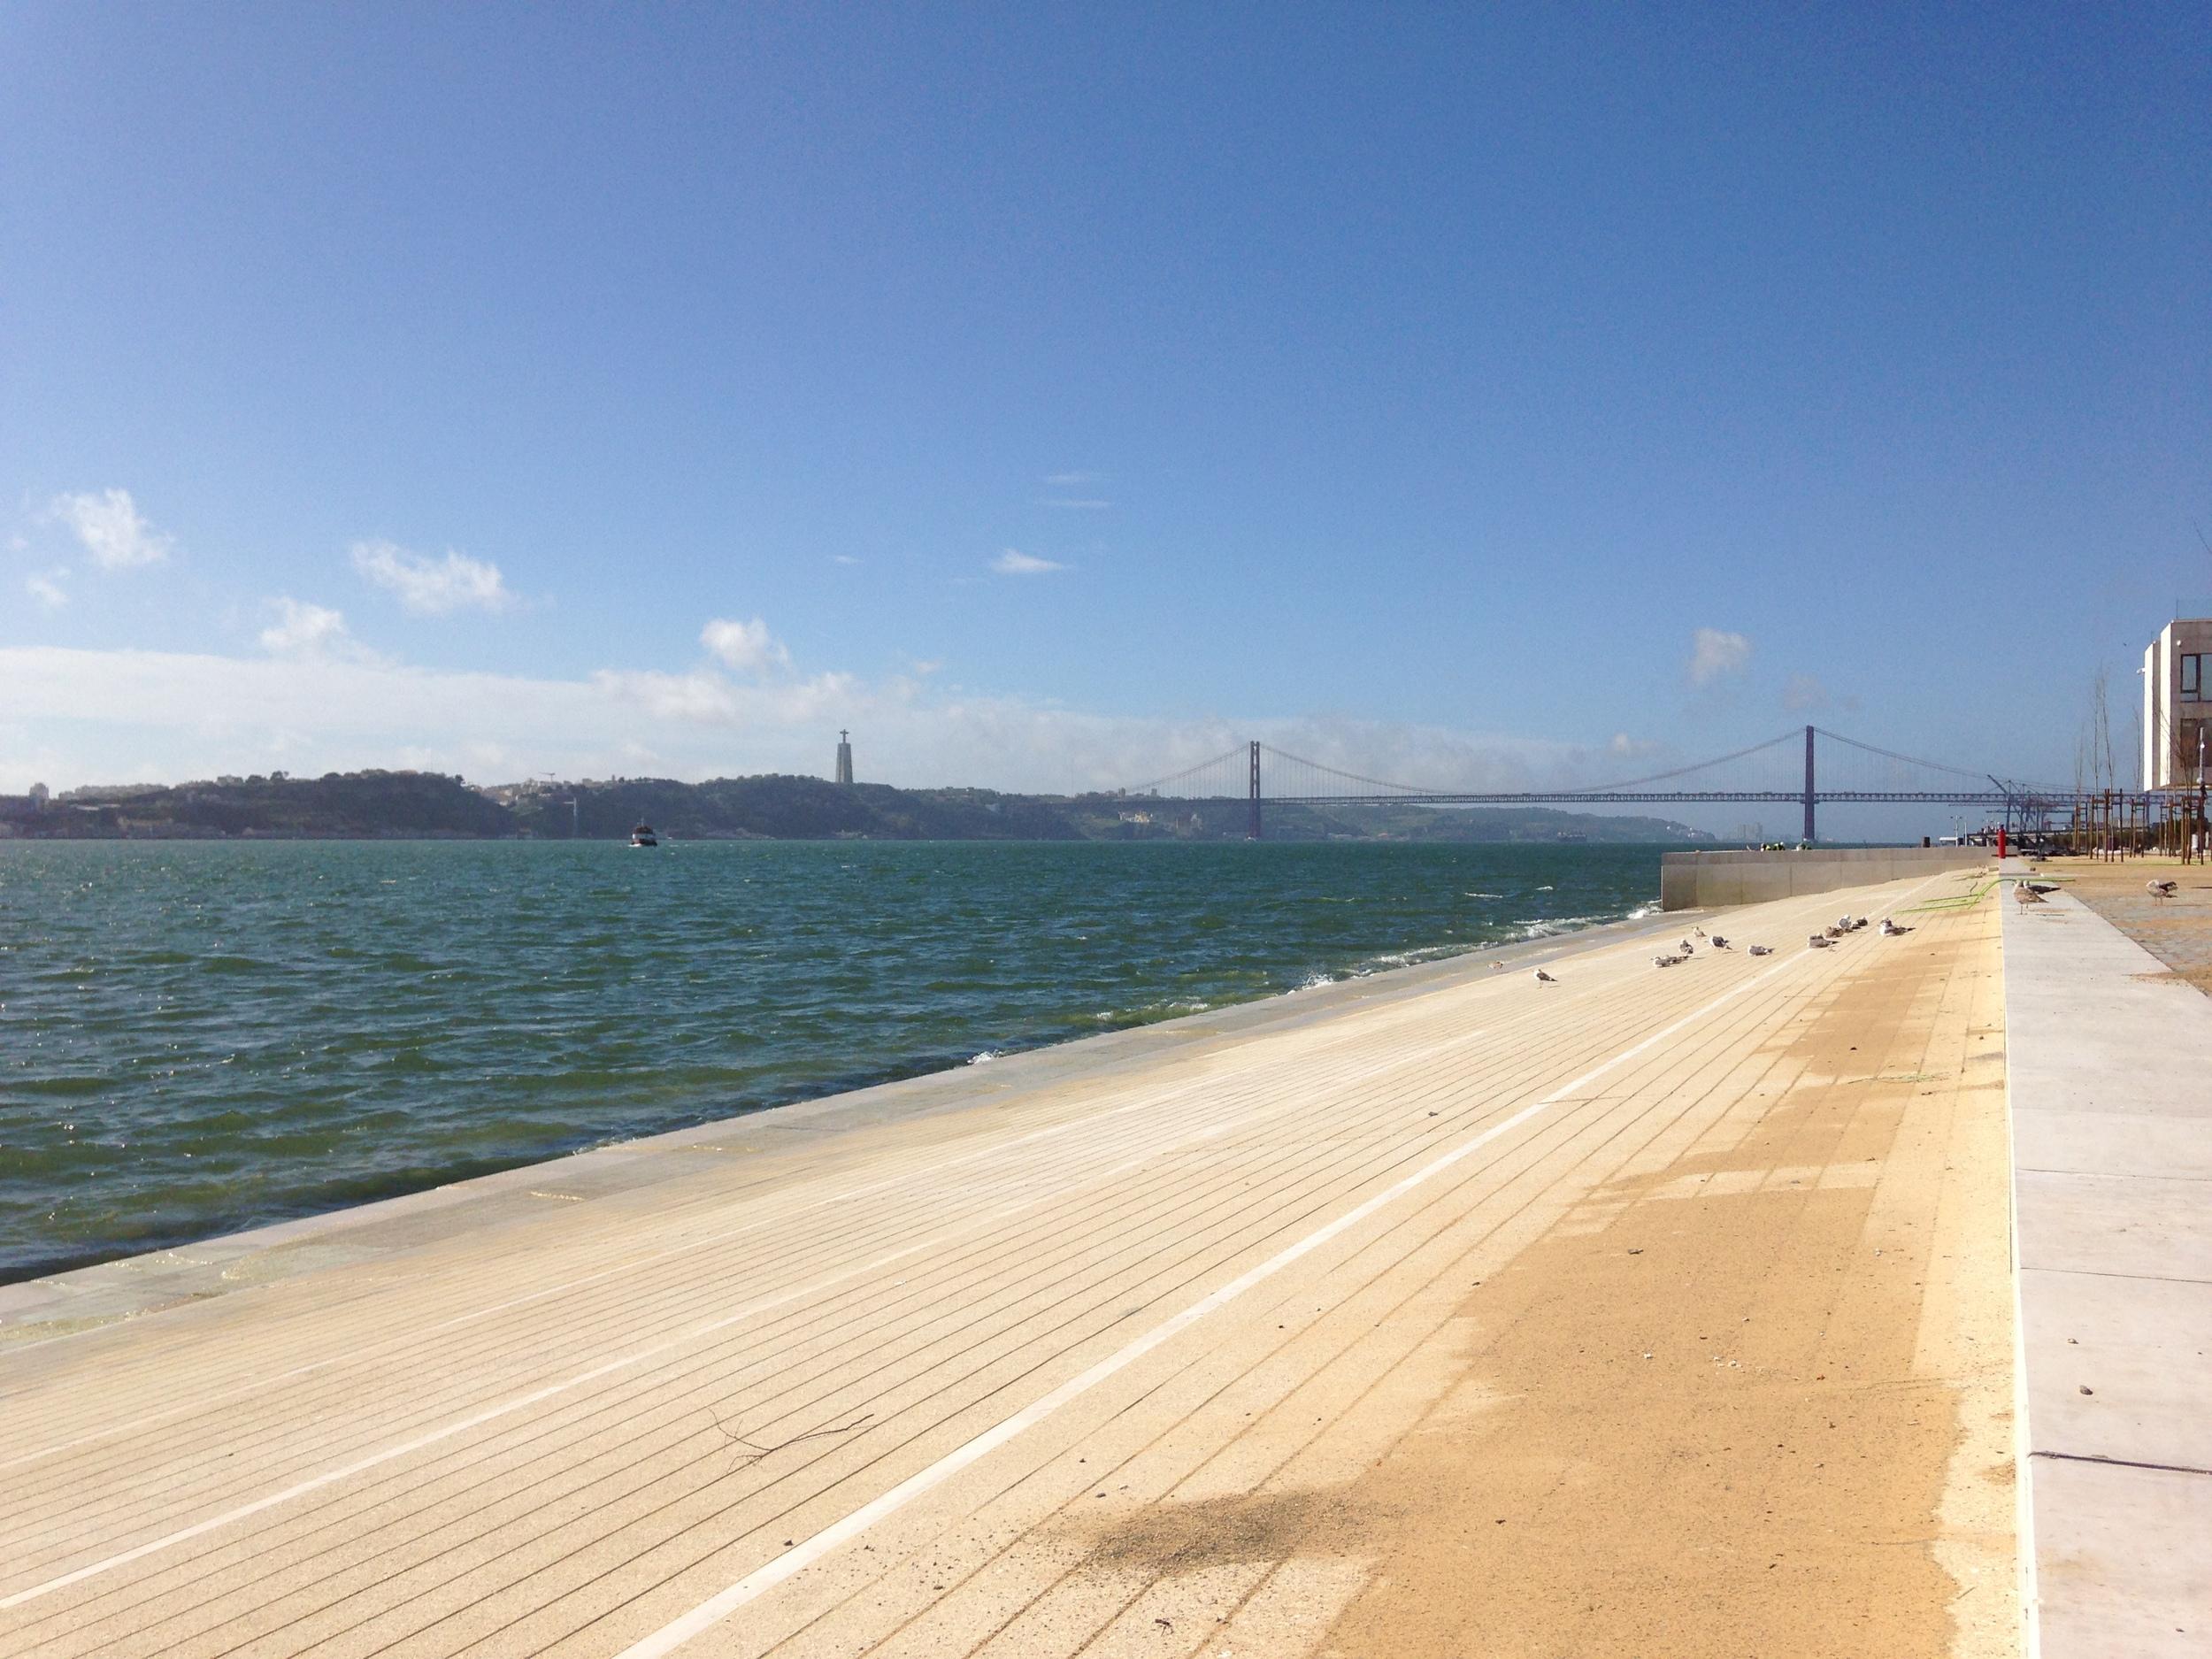 De brede monding van de rivier de Taag, Lissabon